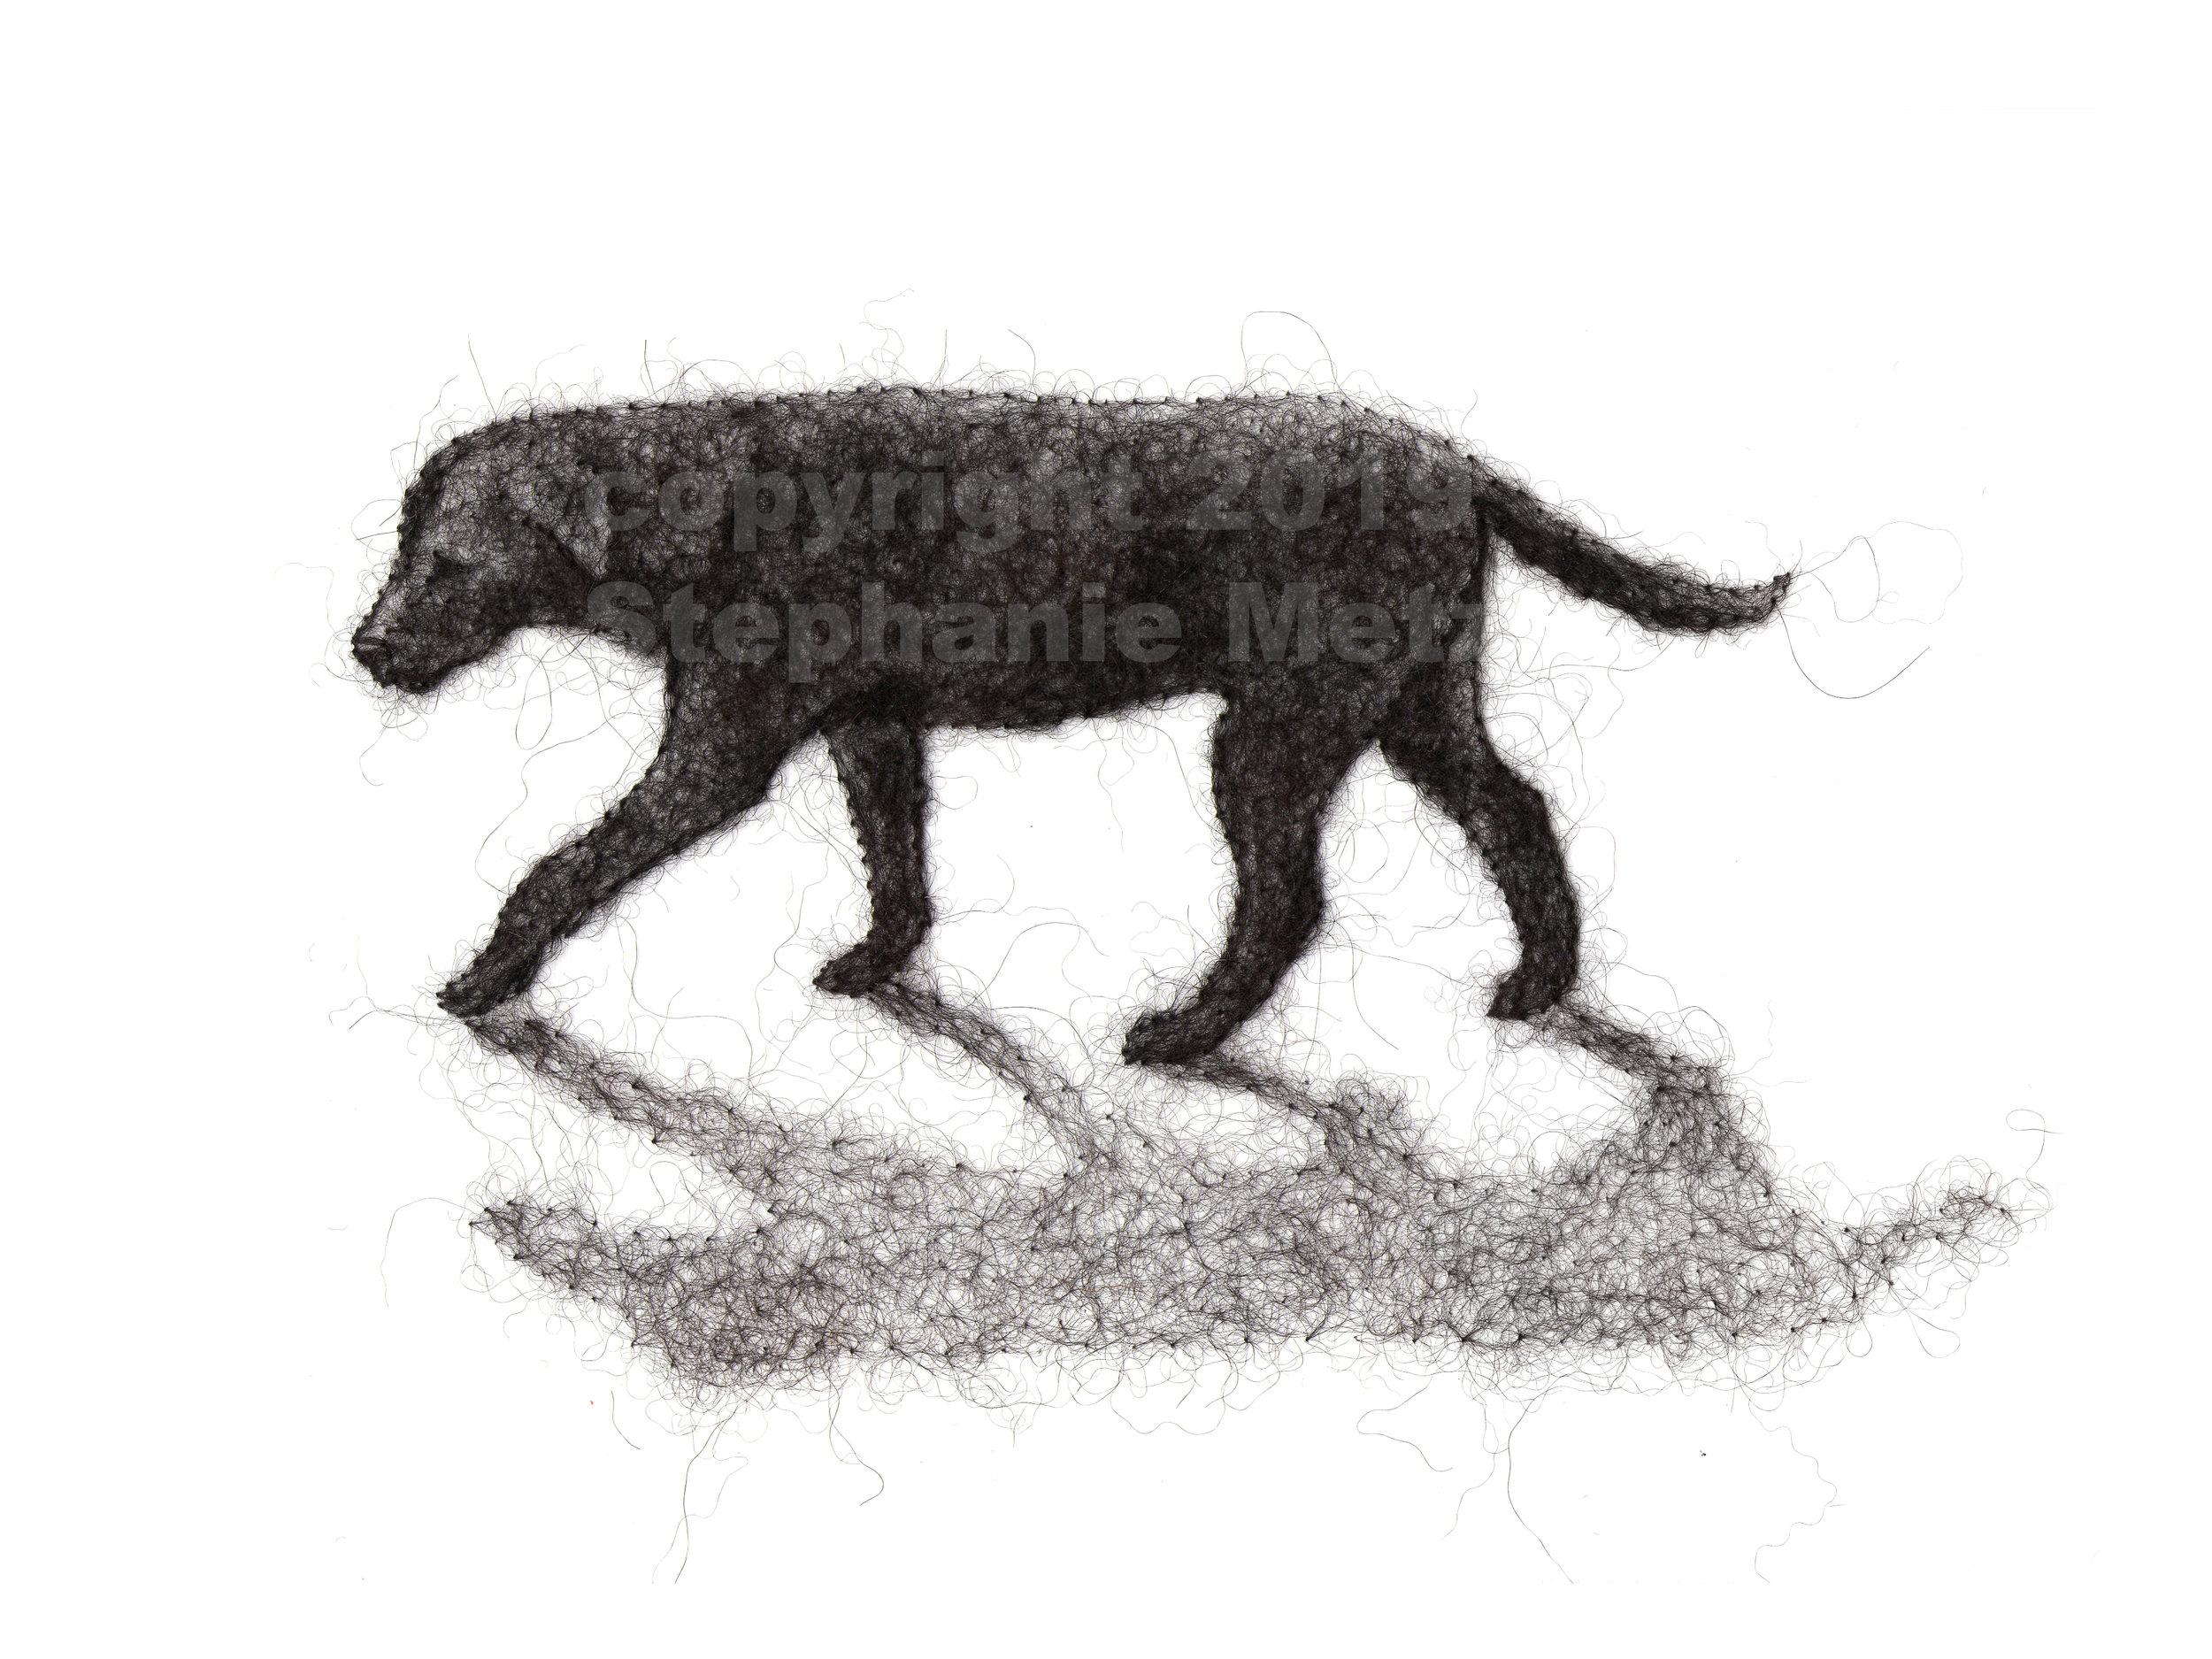 Lab Stroll Archival Print of Wool Drawing ($75 Pledge)